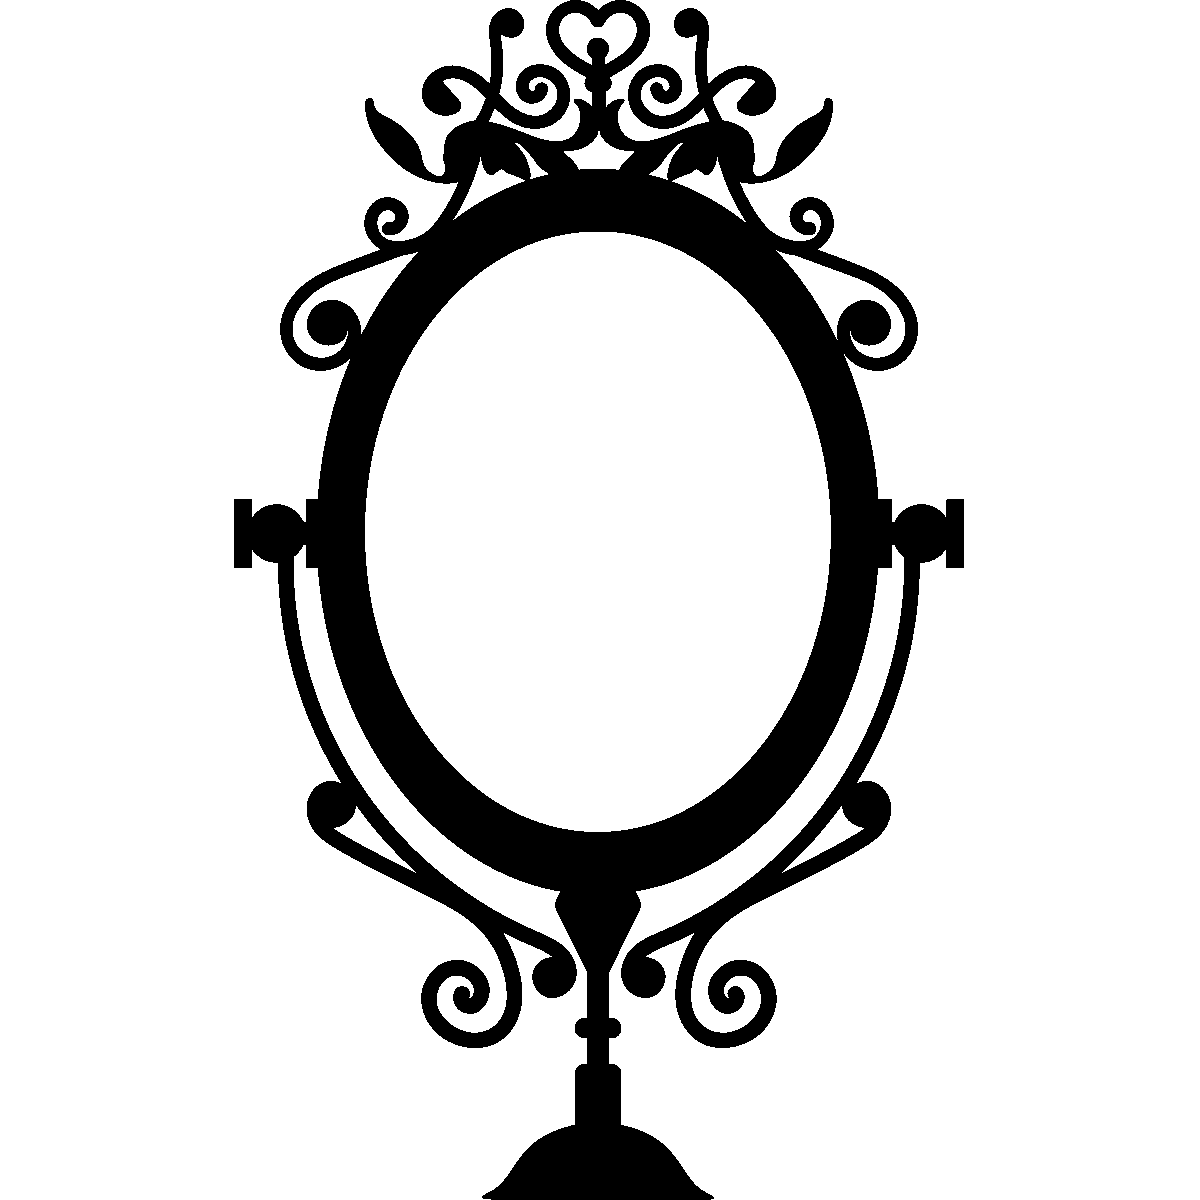 Sticker Cadre Baroque Pour Miroir Stickers Stickers Art